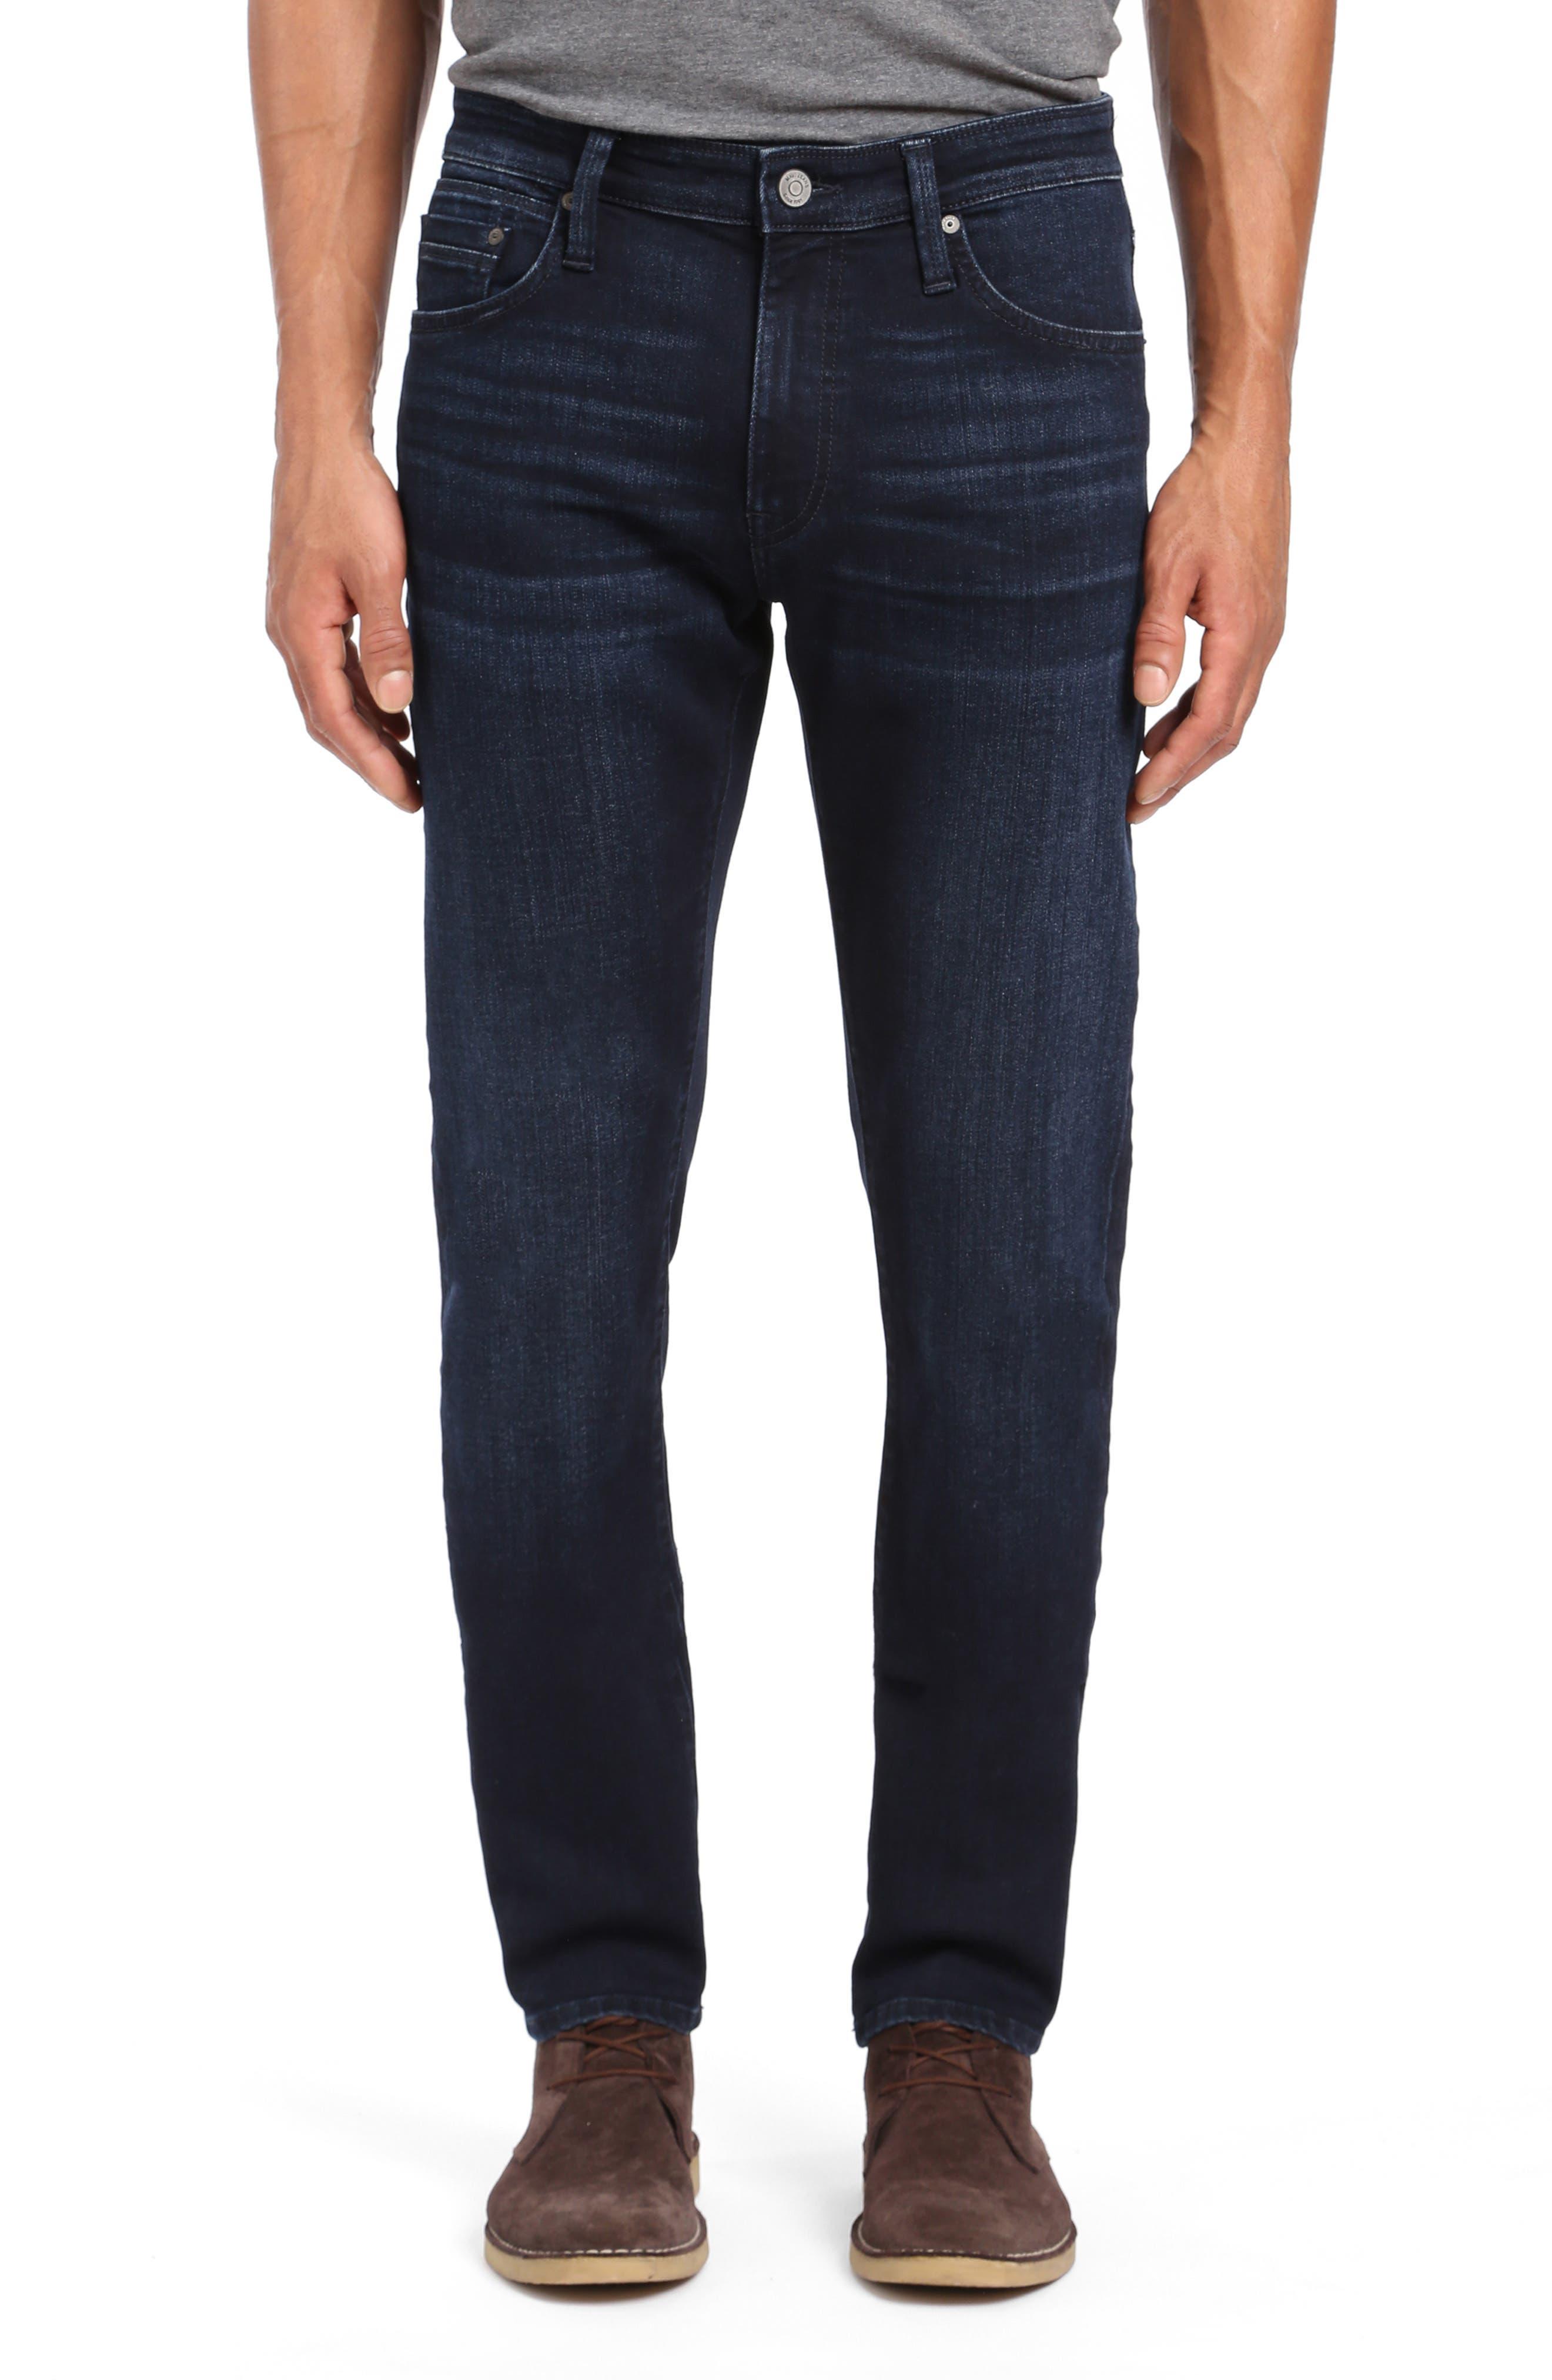 MAVI JEANS Jake Skinny Fit Jeans, Main, color, 401